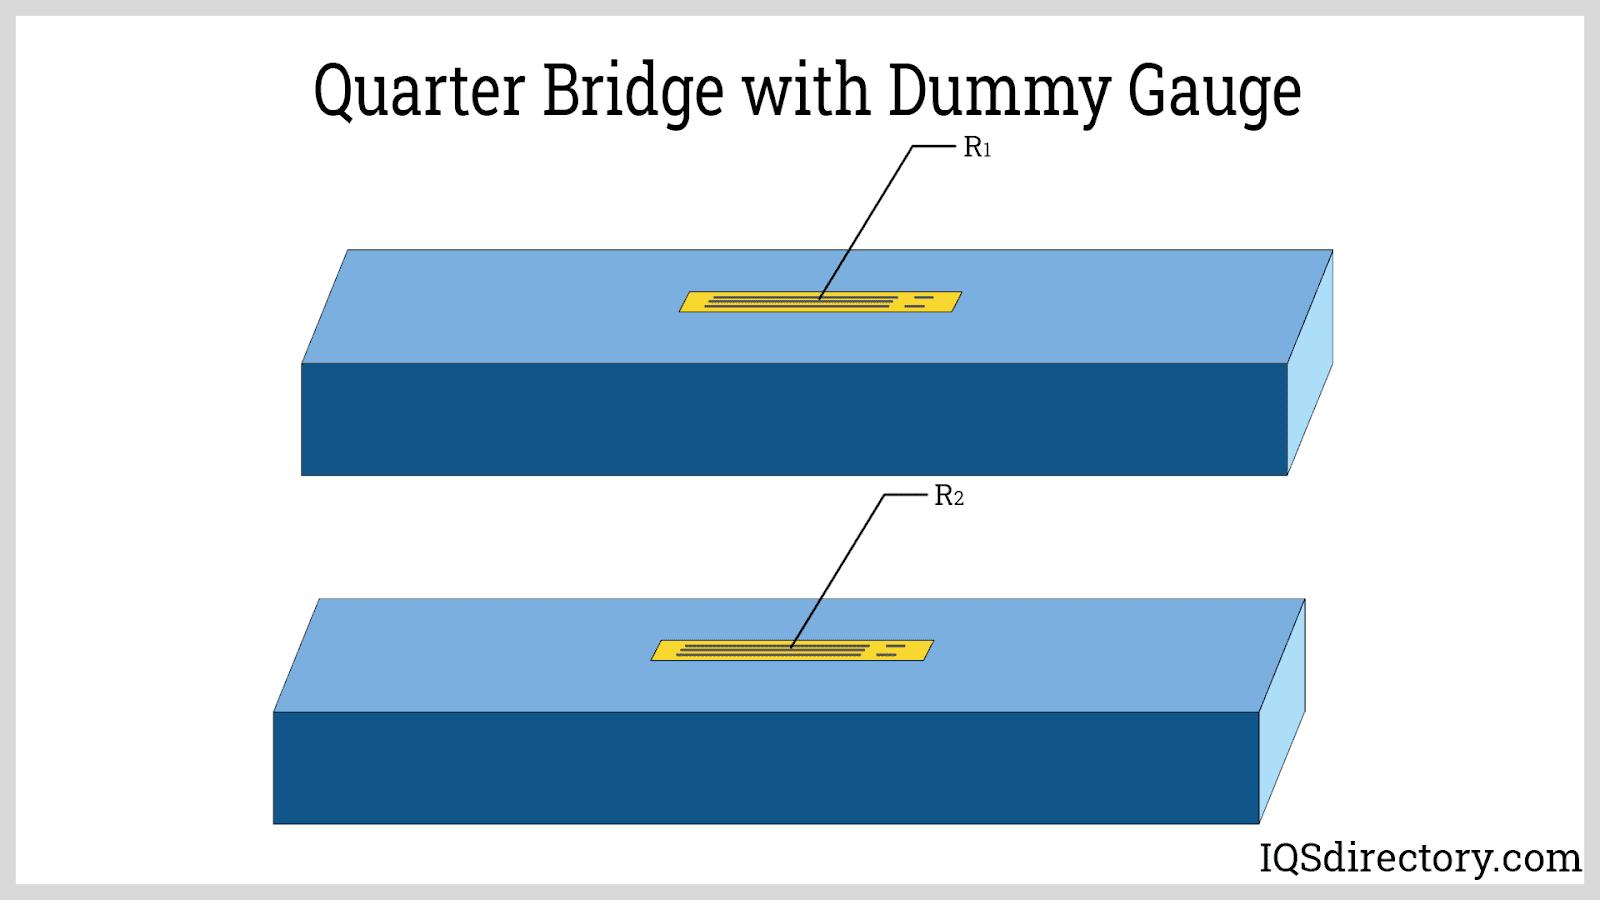 Quarter Bridge with Dummy Gauge